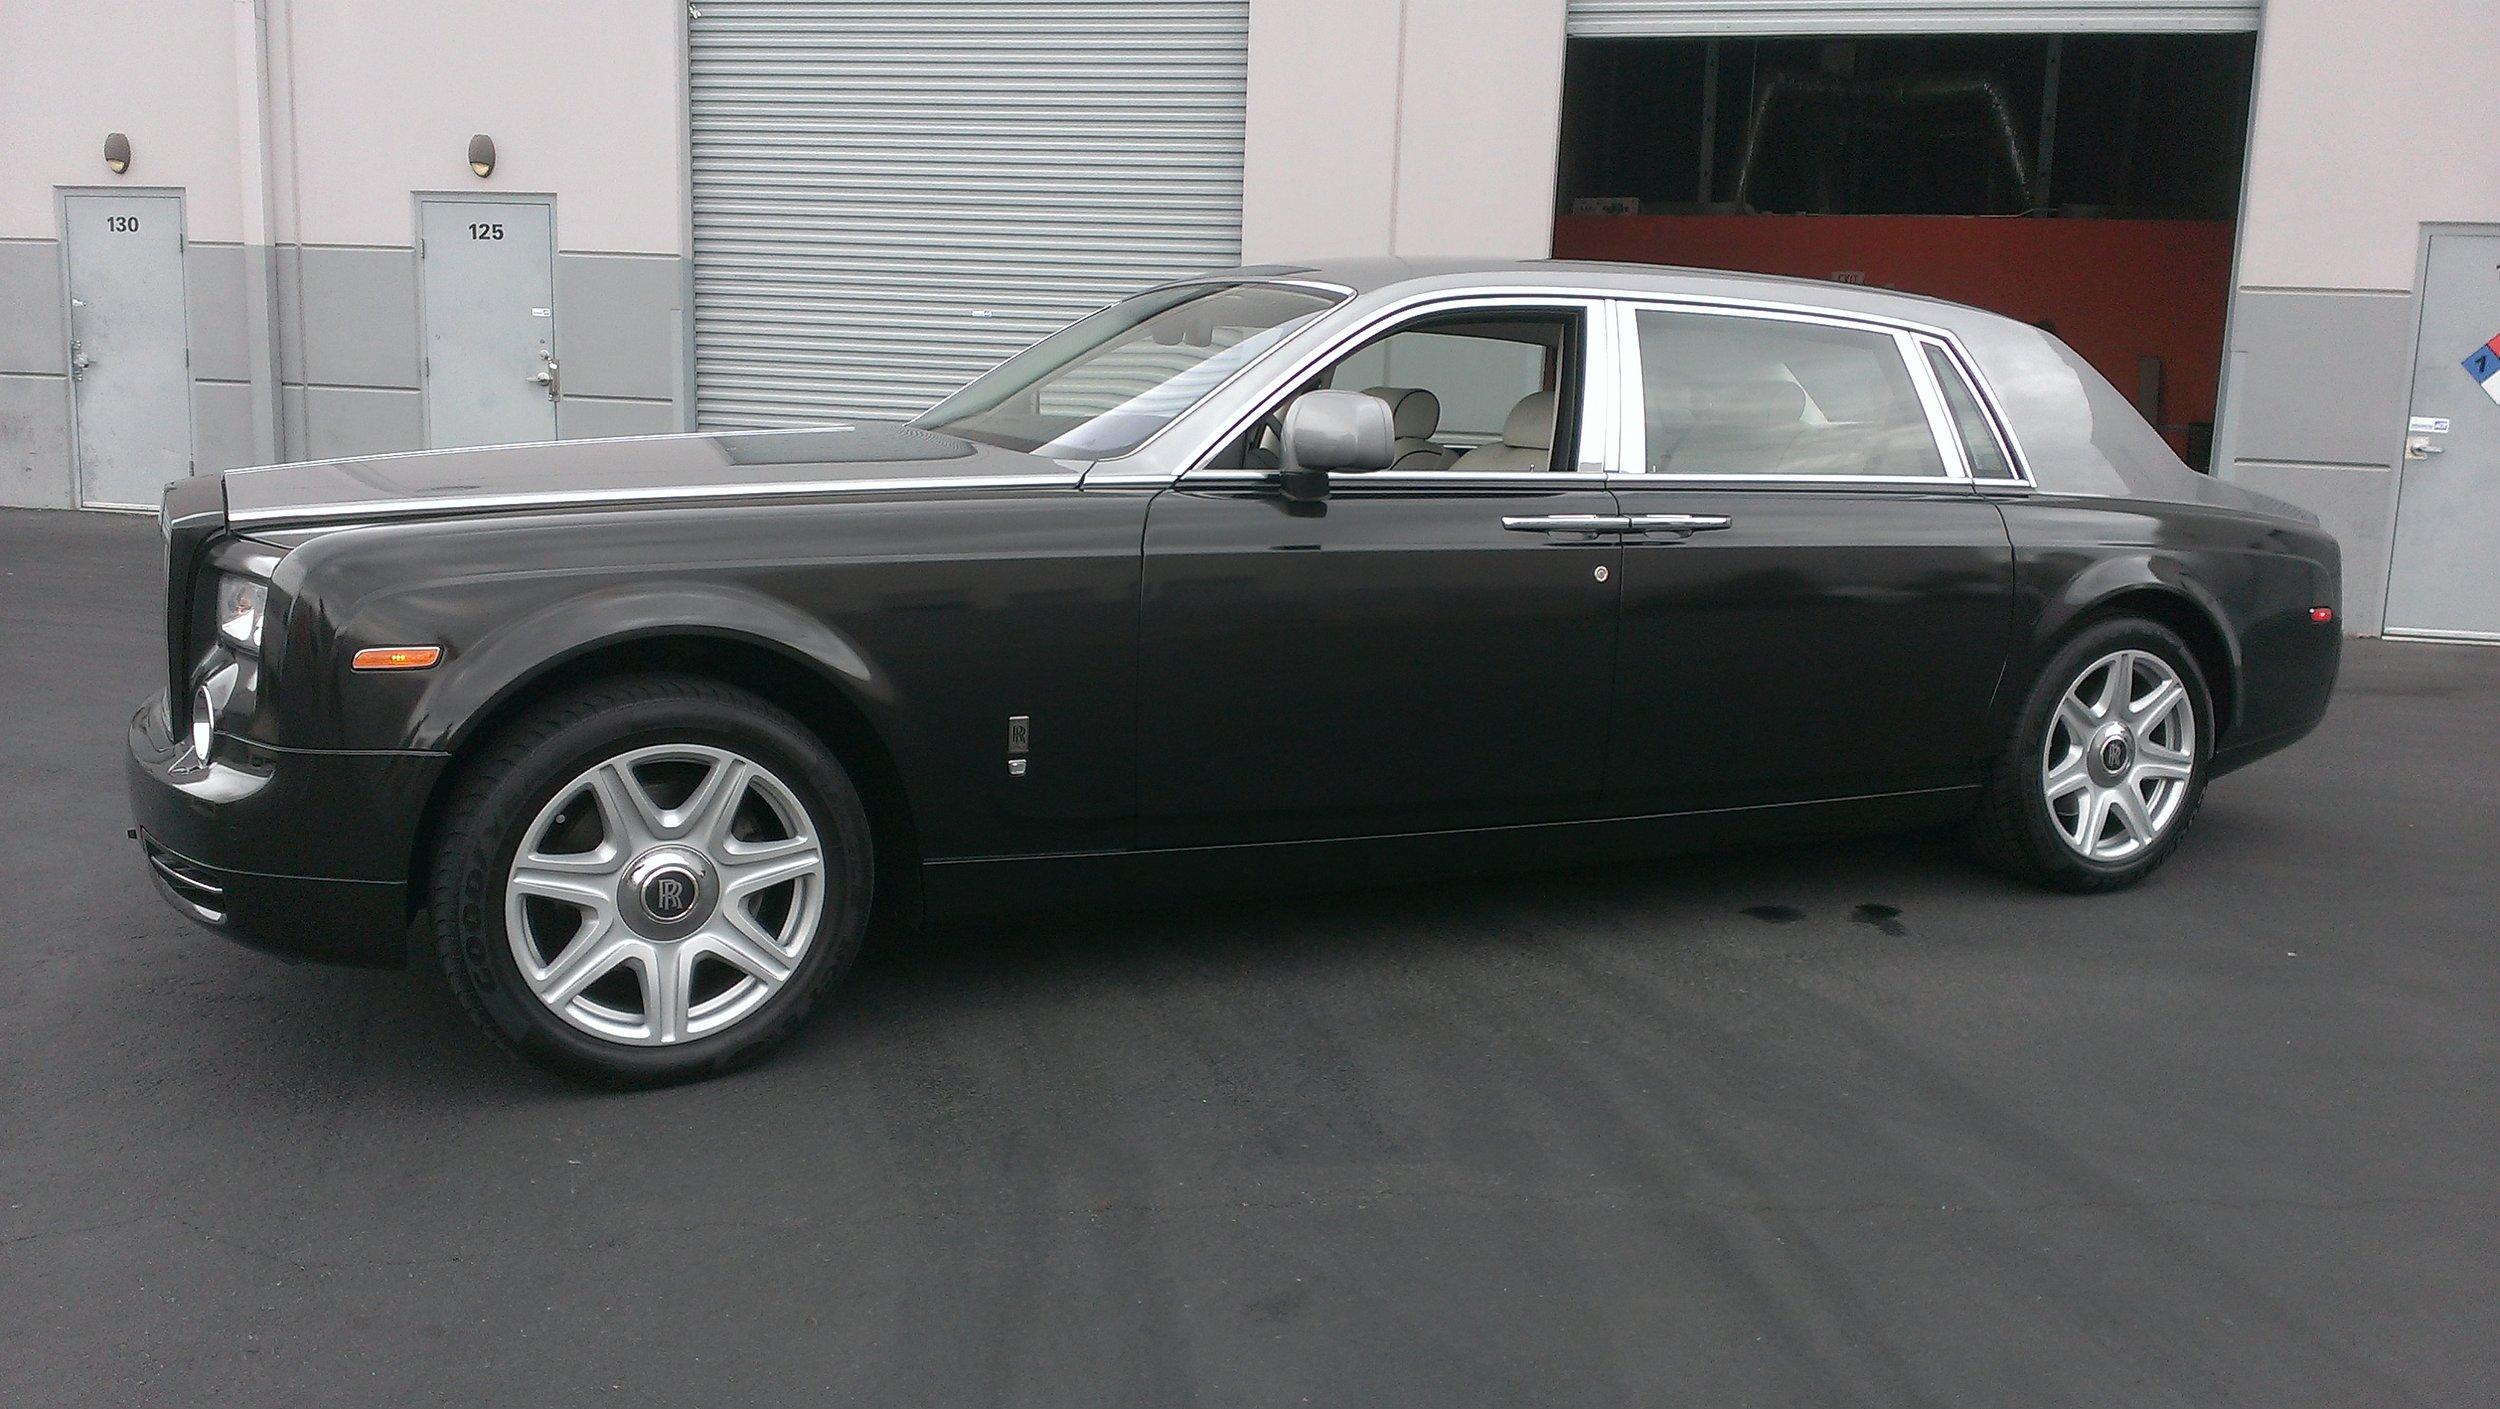 Rolls Royce Phantom Metallic Black